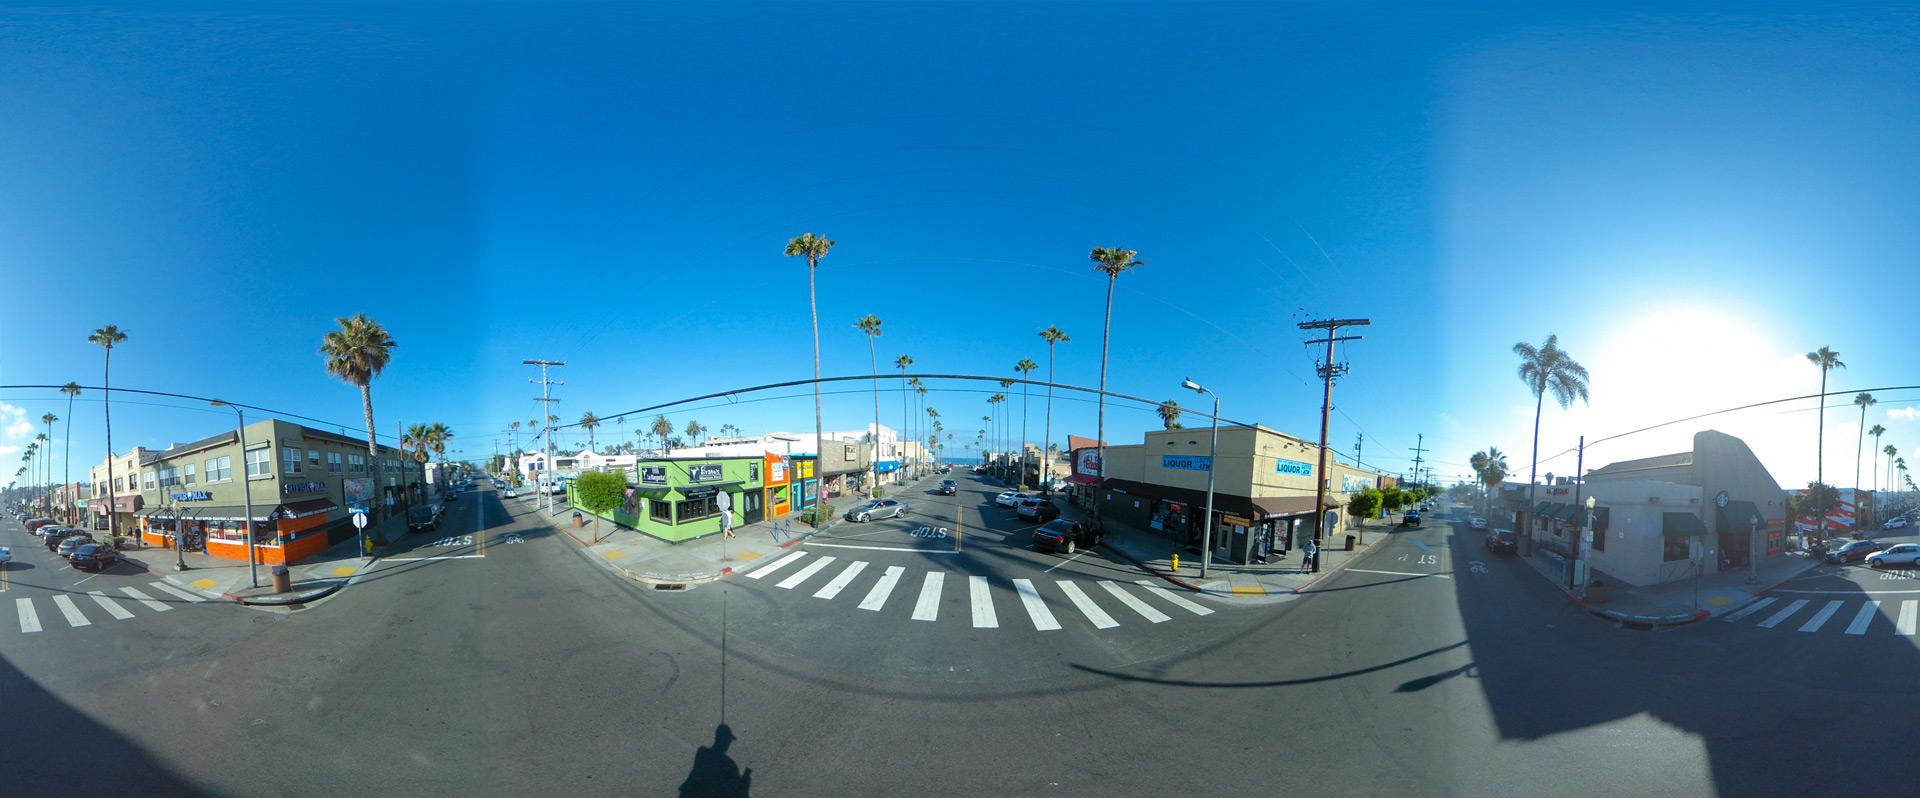 Ocean Beach, San Diego - Newport and Bacon